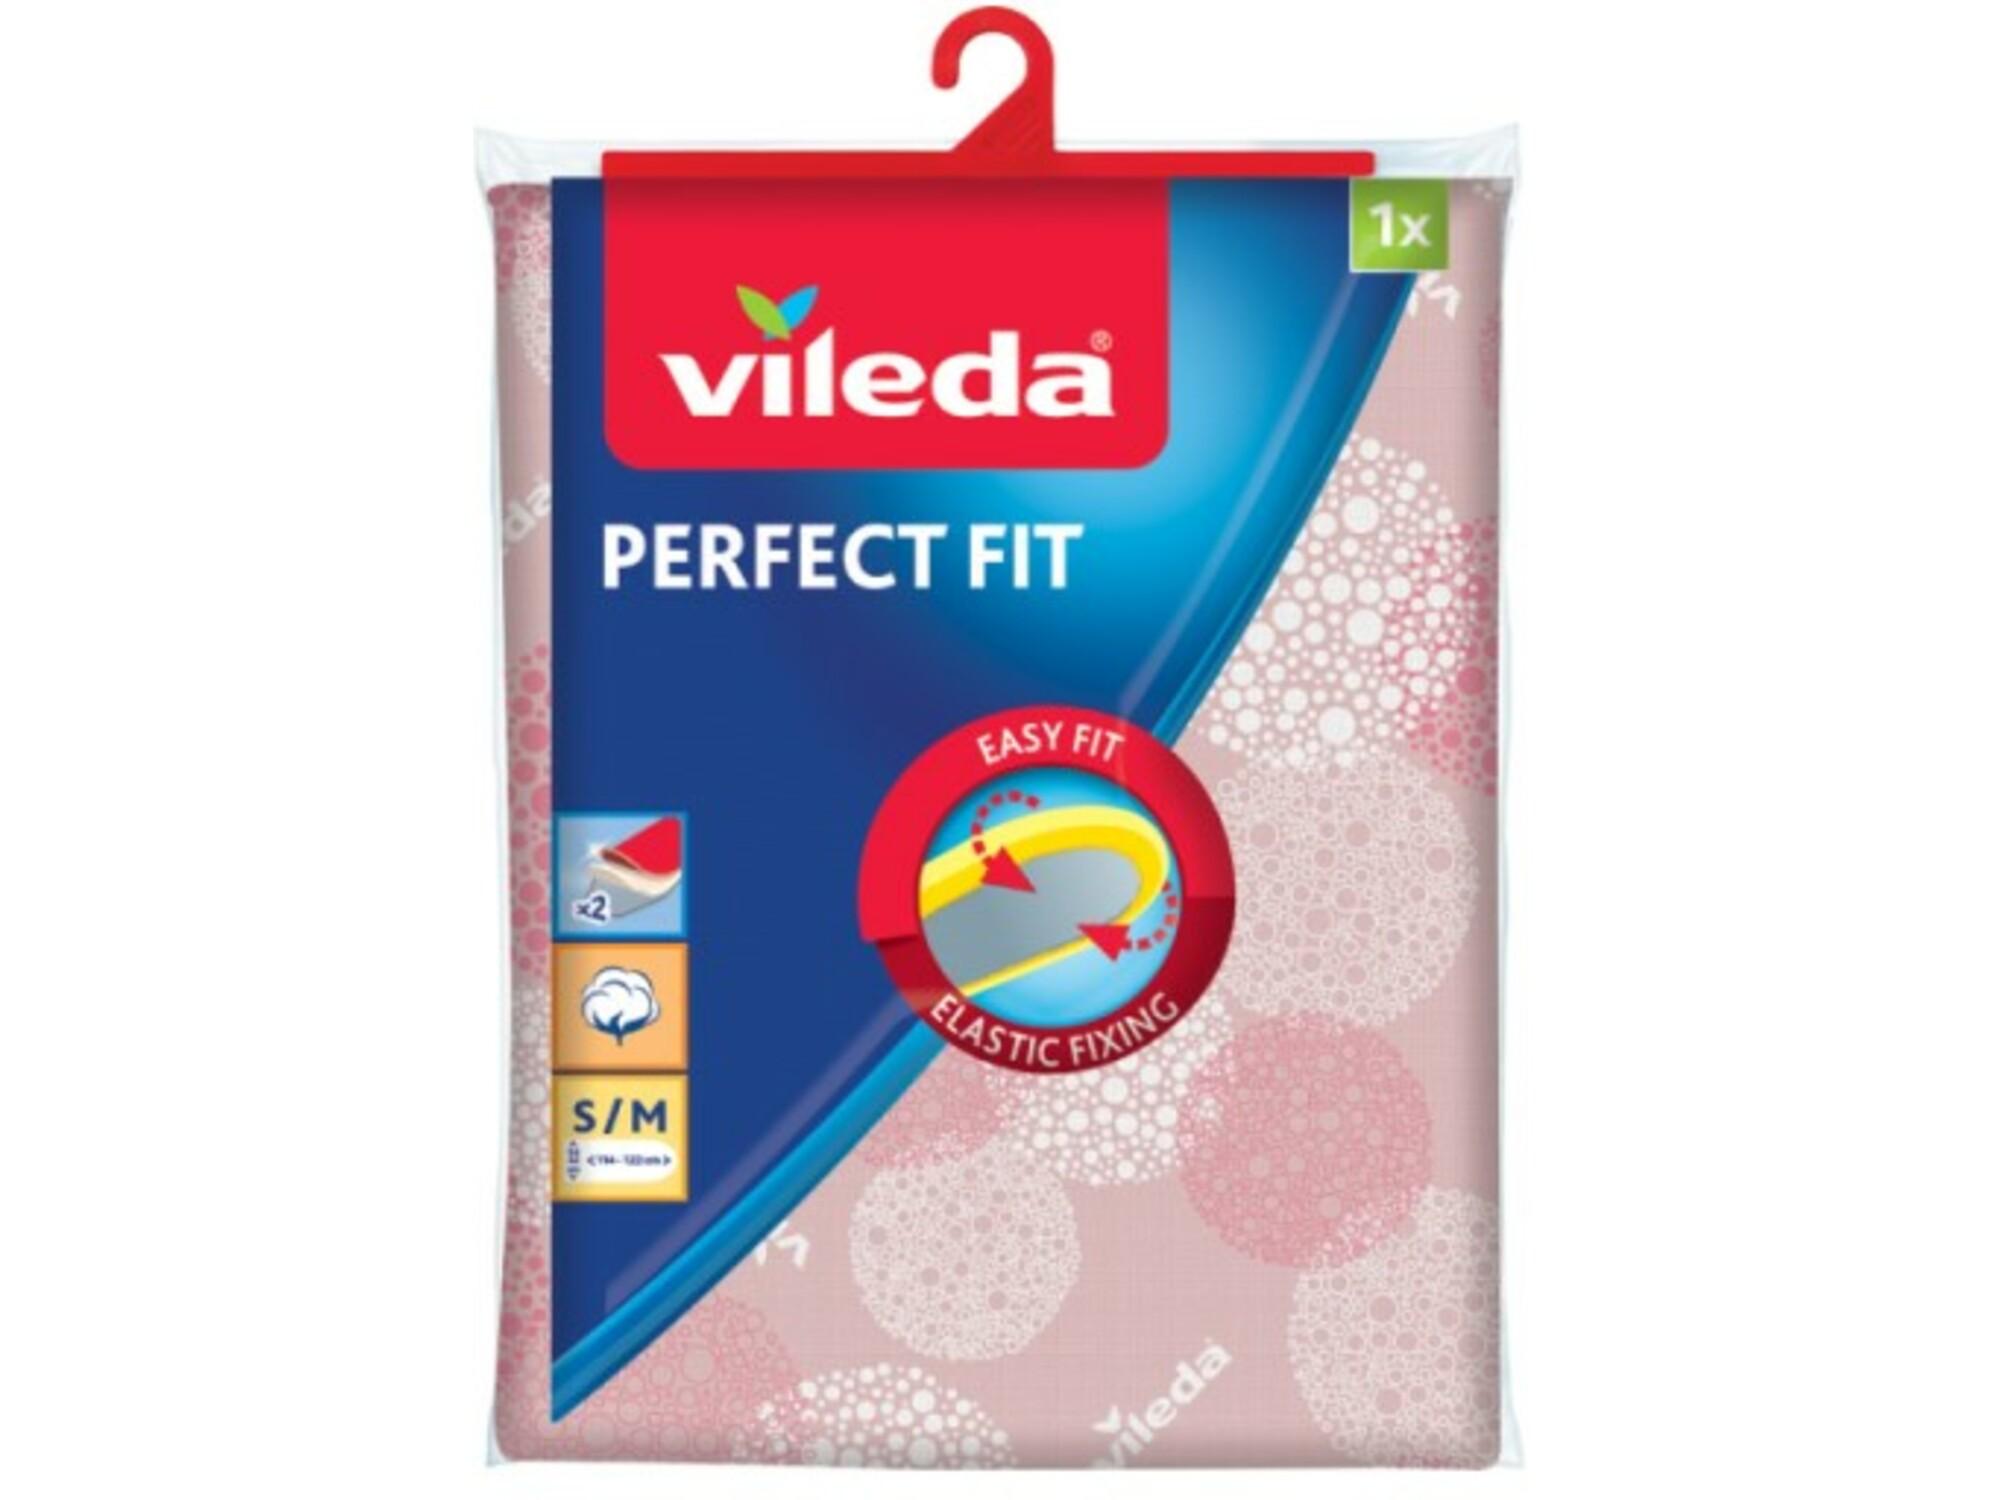 Vileda Navlaka za dasku perfect fit pink bubble 6701905